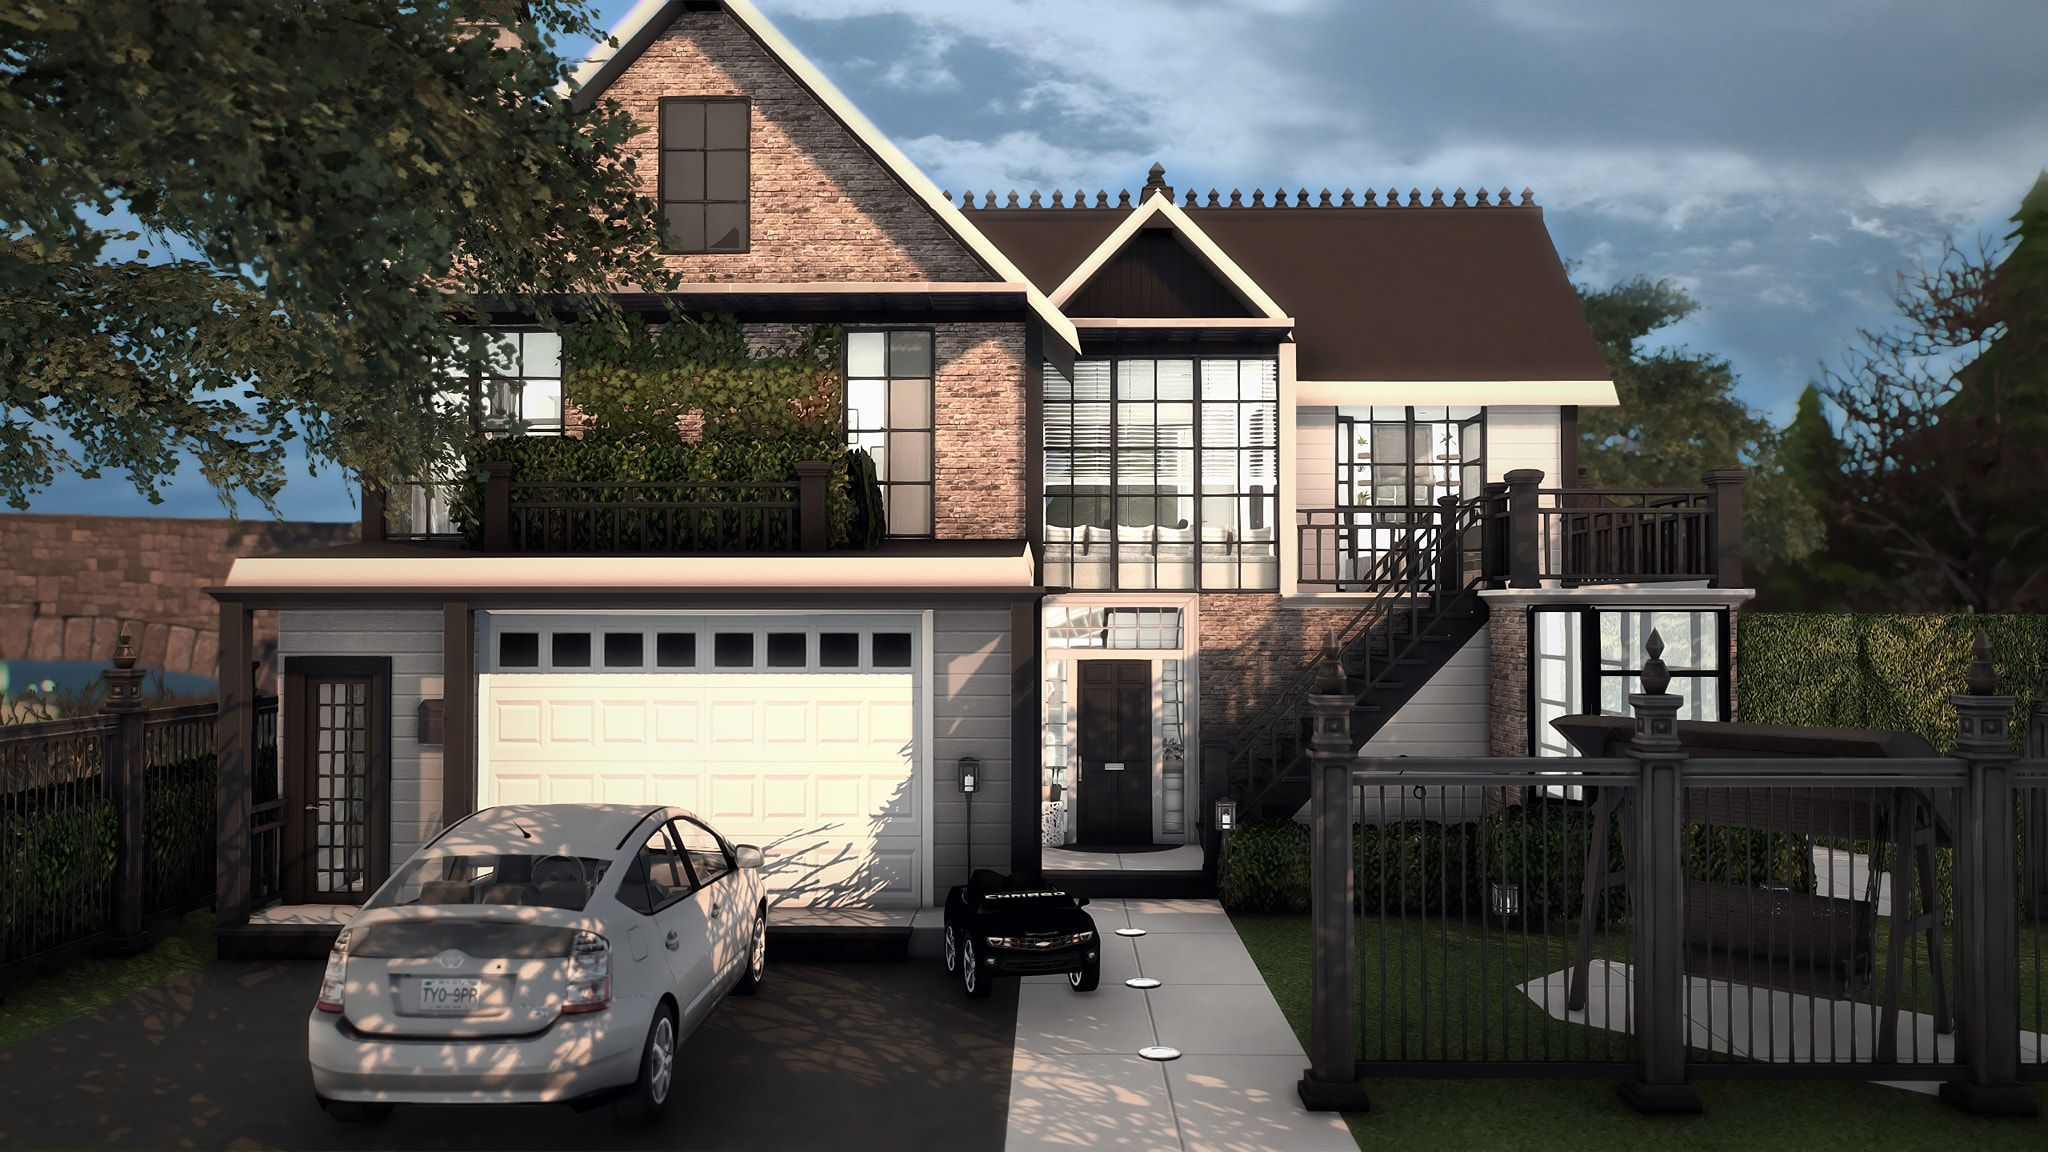 Jasmine Road Sims House Sims Building Sims 4 Houses